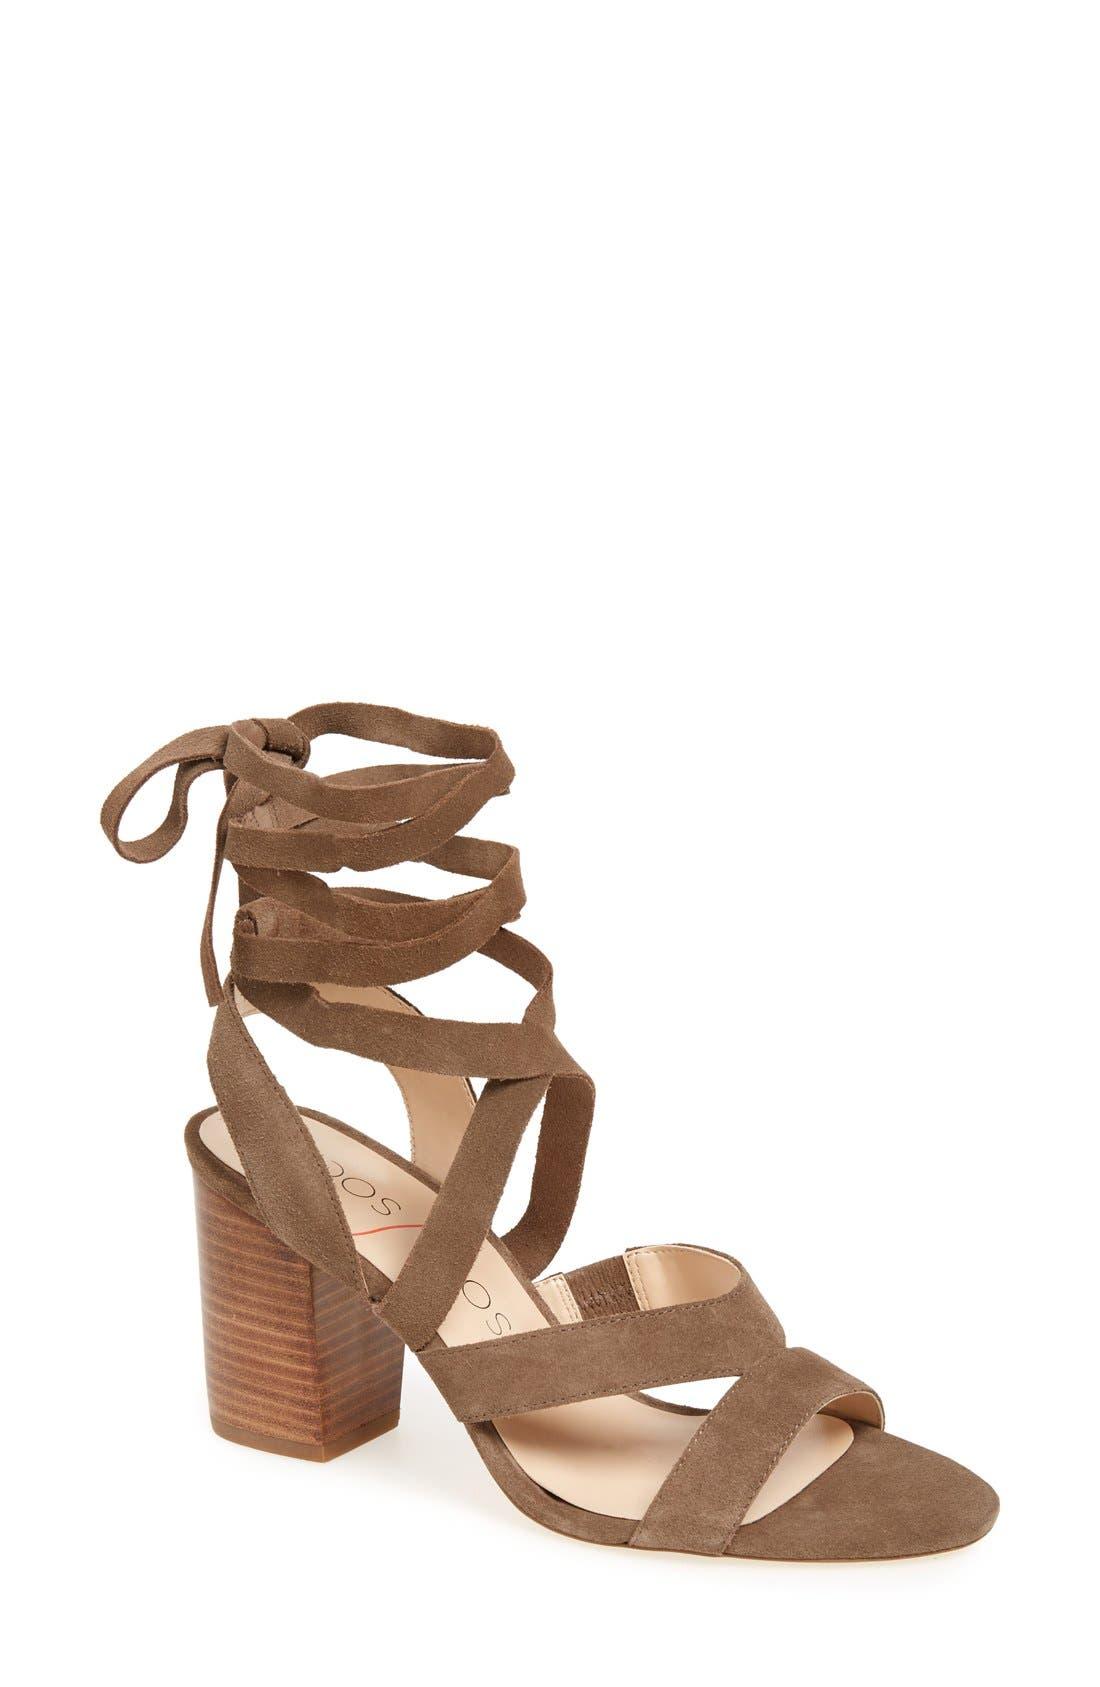 Main Image - Sole Society 'Lyla' Lace-Up Sandal (Women)